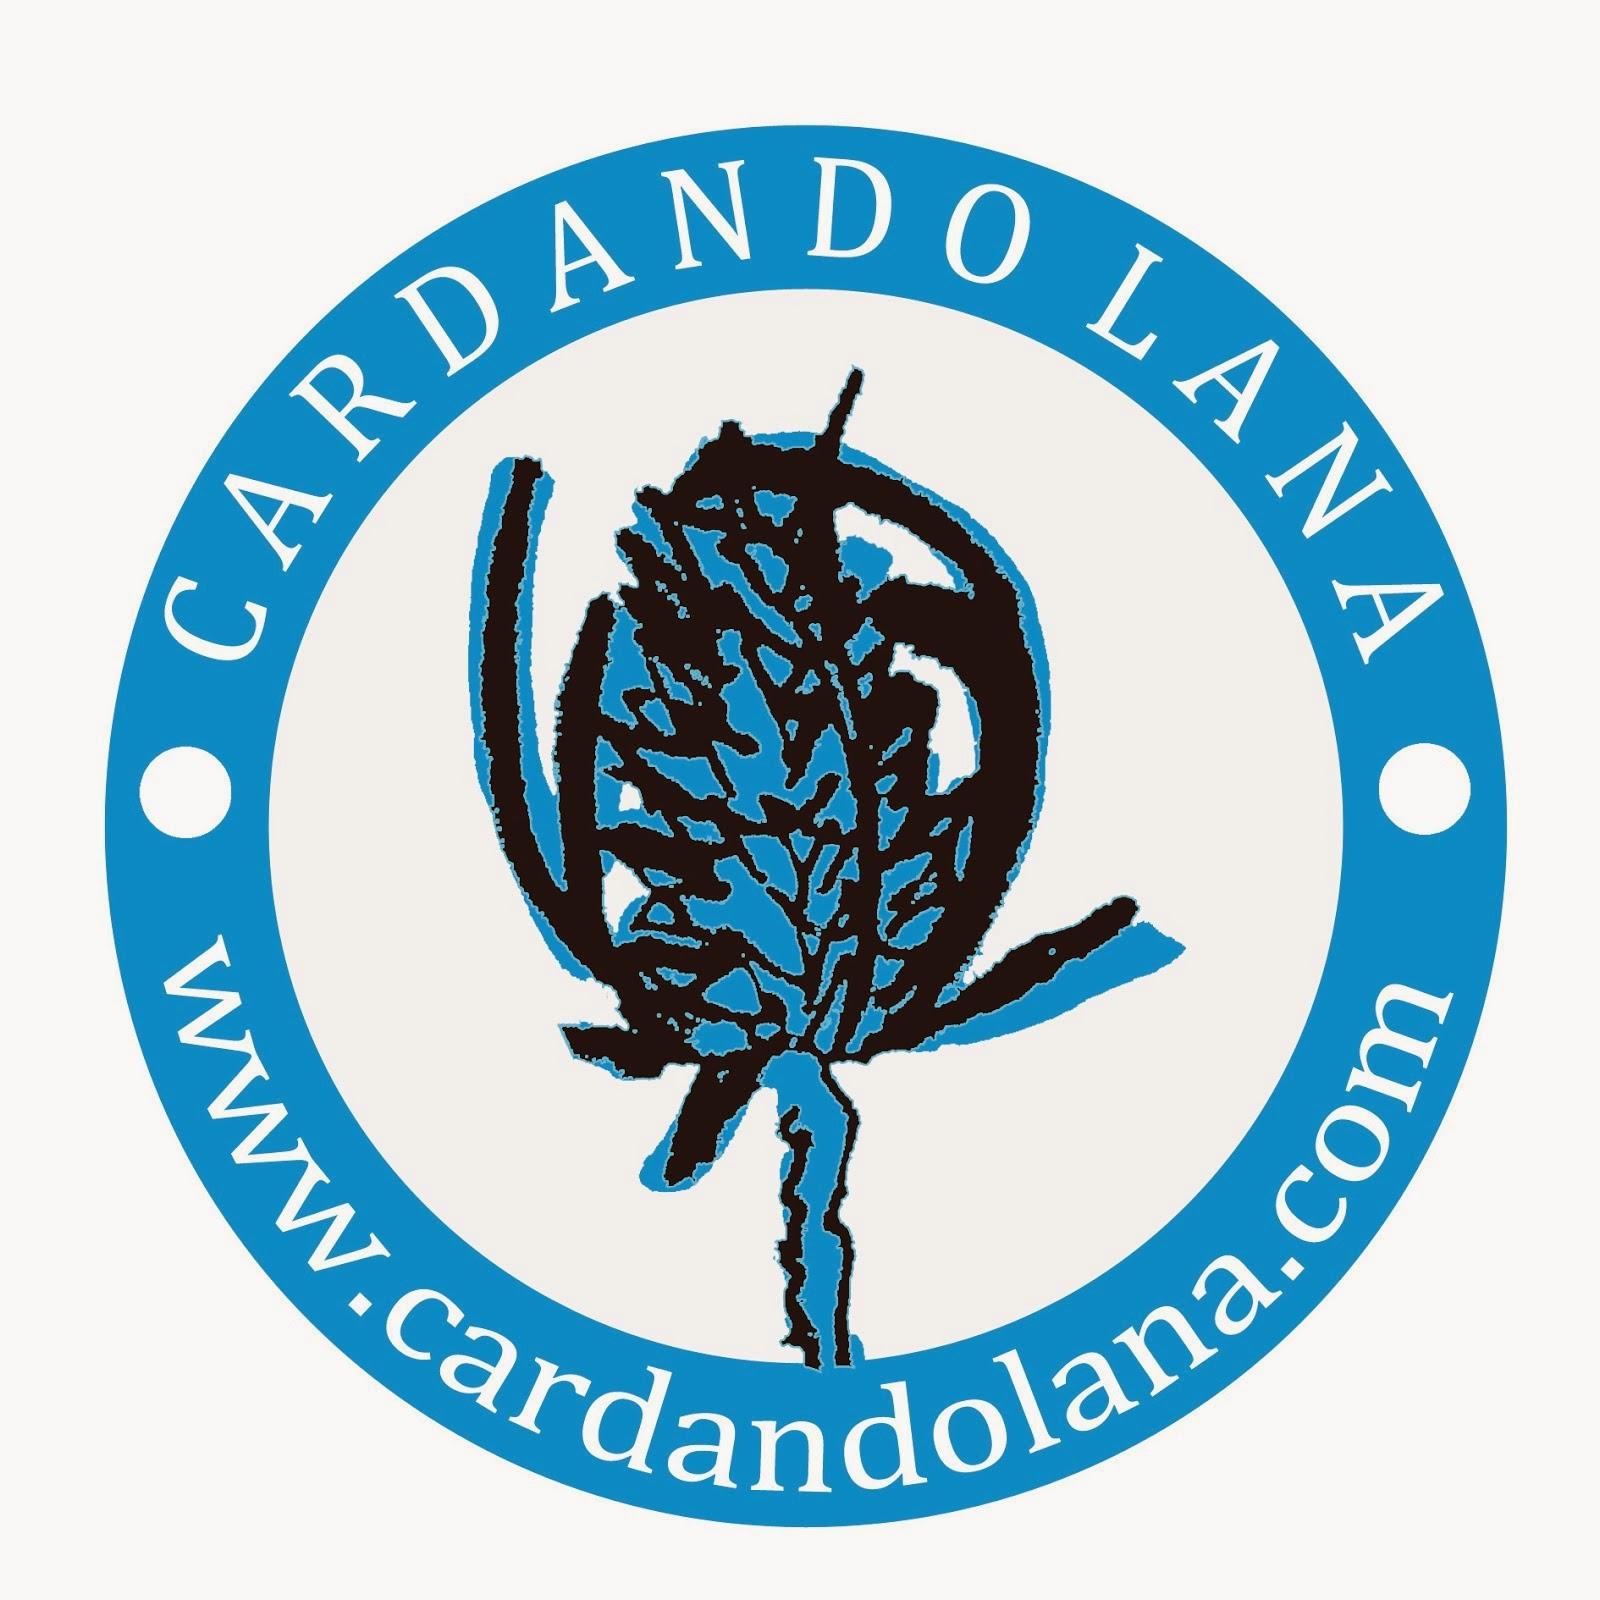 CARDANDO LANA - Tienda